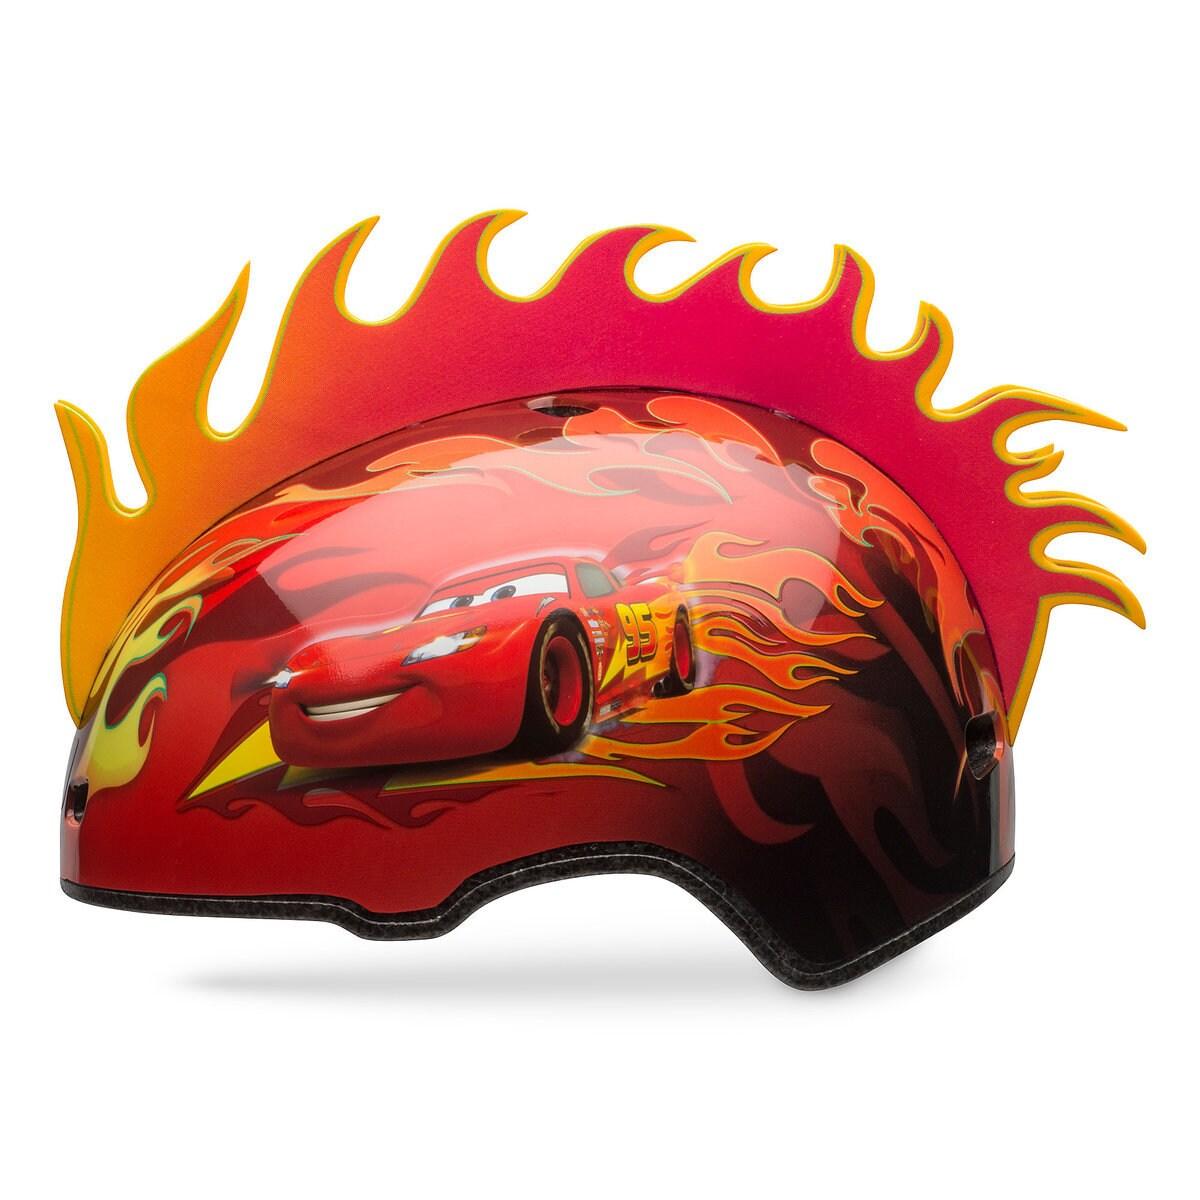 19a1d19690 Product Image of Lightning McQueen Bike Helmet # 1